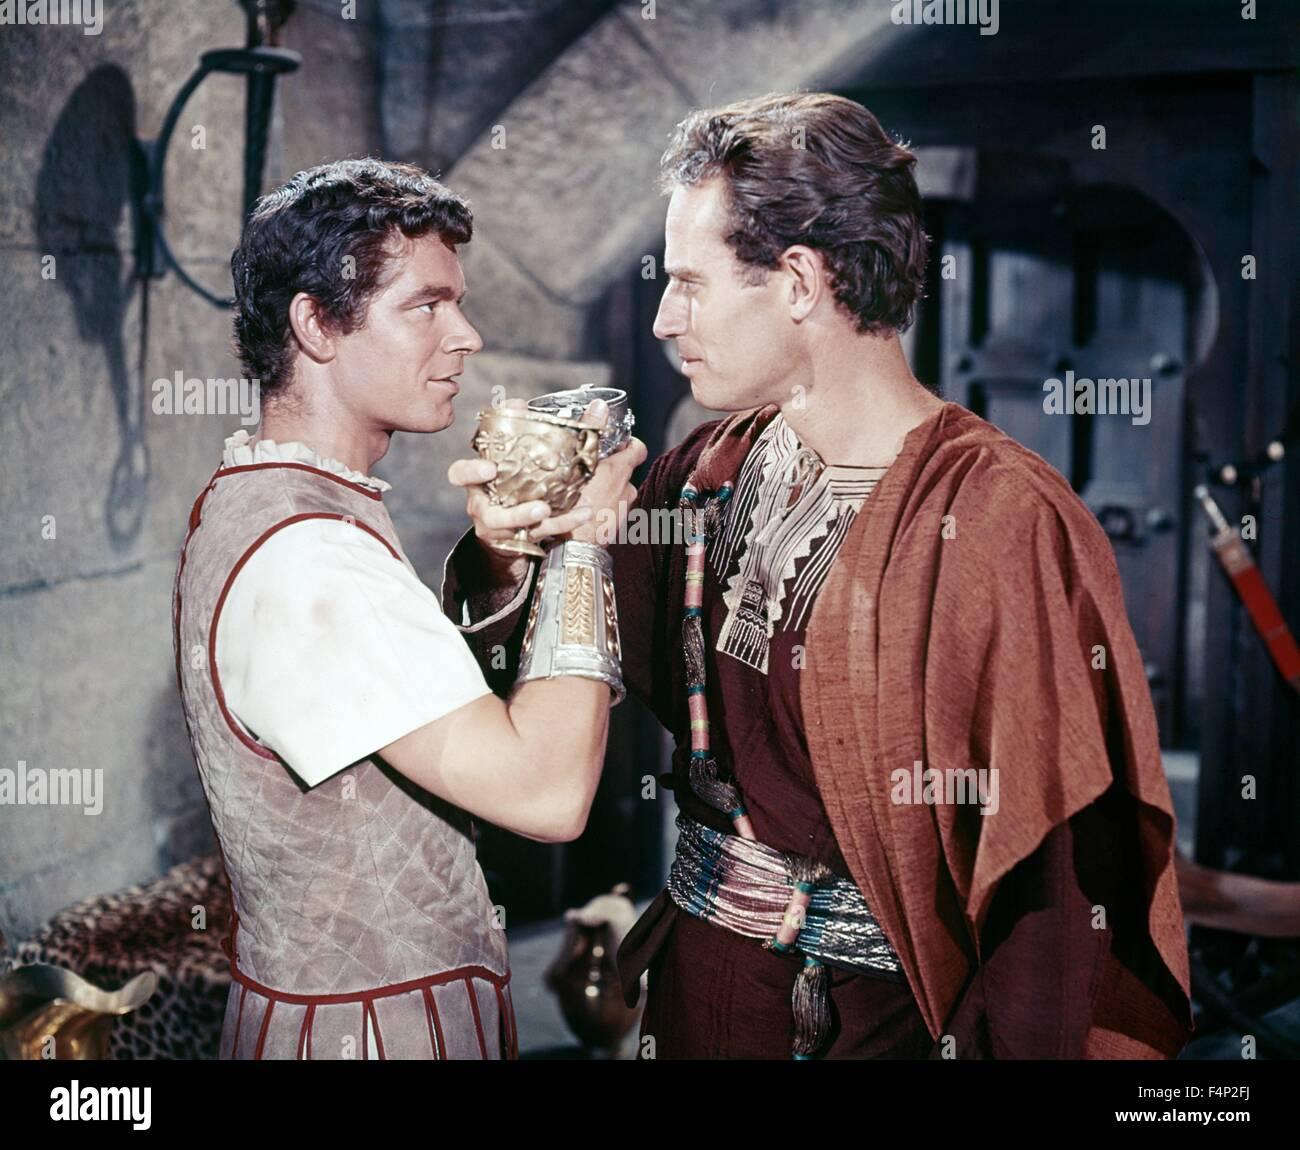 Stephen Boyd, Charlton Heston / Ben-Hur 1959 directed by William Wyler - Stock Image